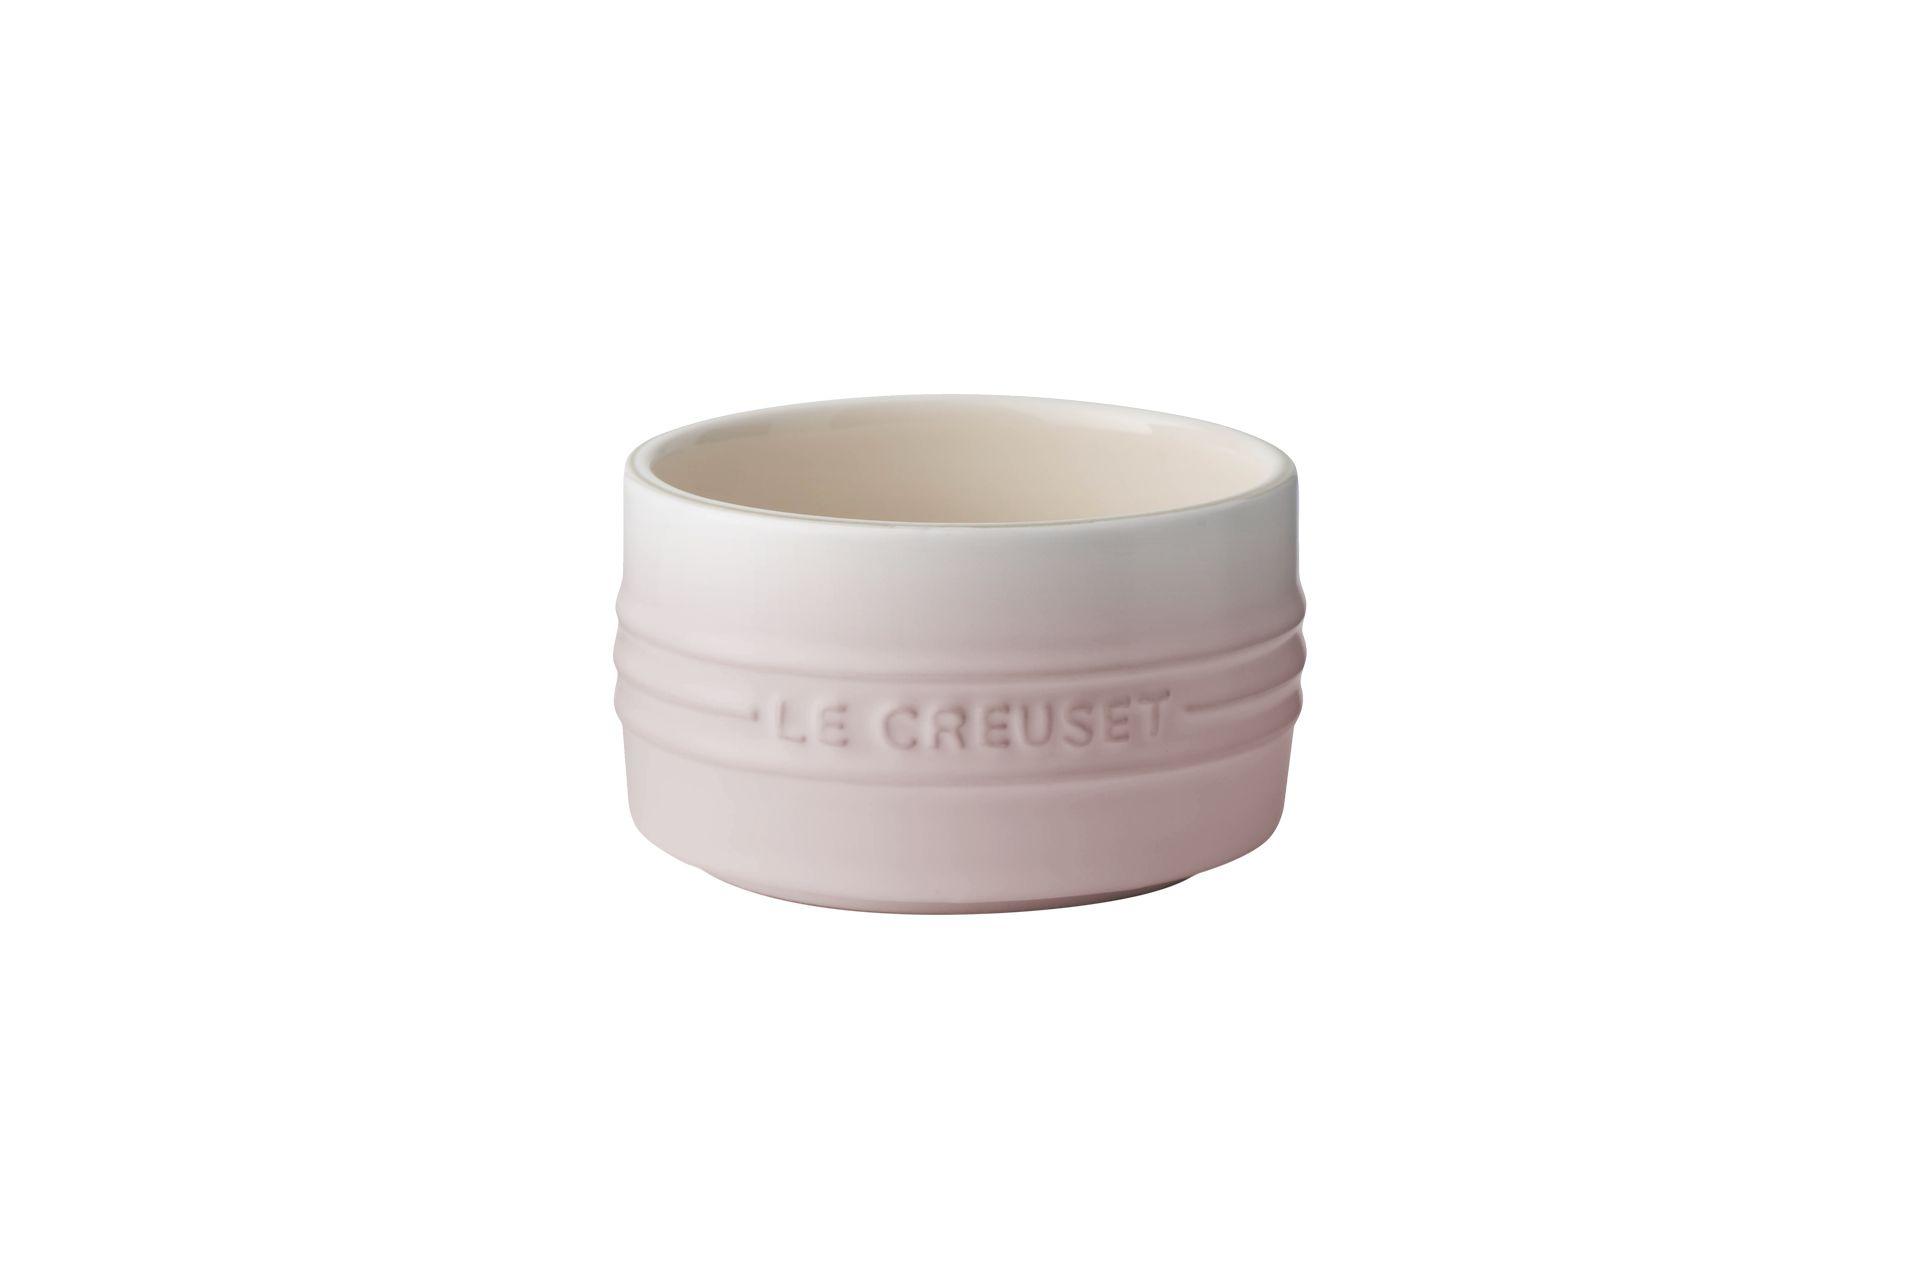 Le Creuset Stapelbare Förmchen Shell Pink